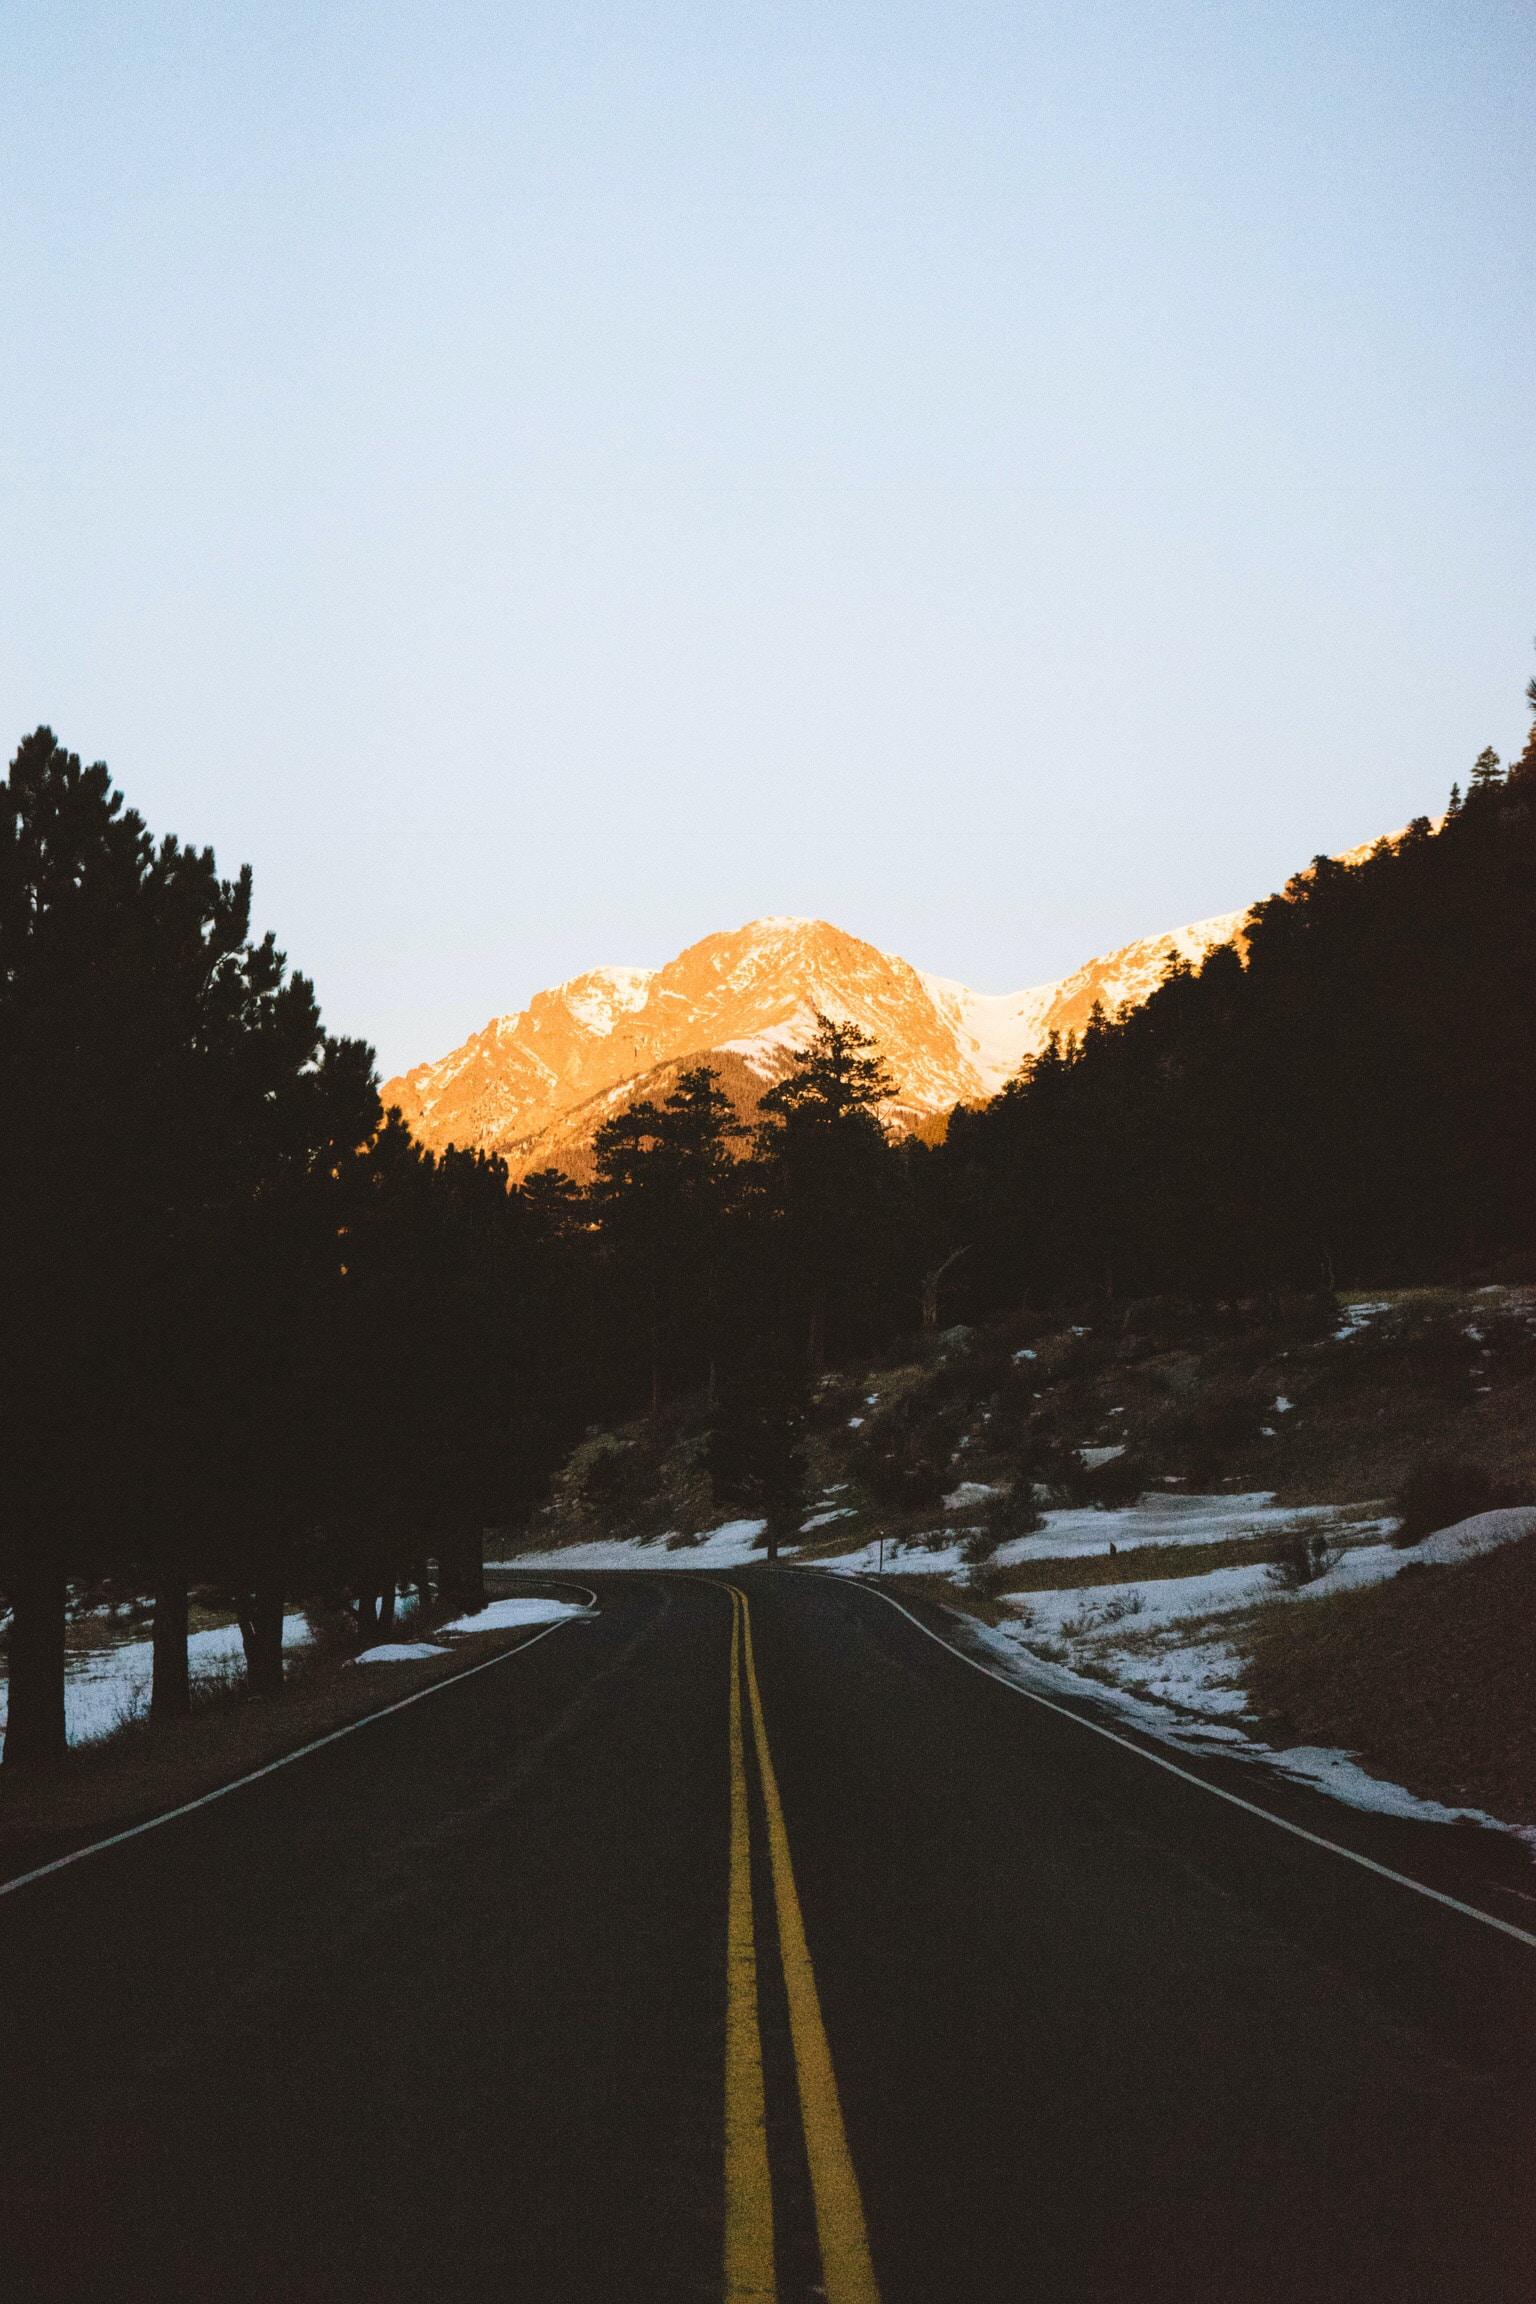 road in between of trees